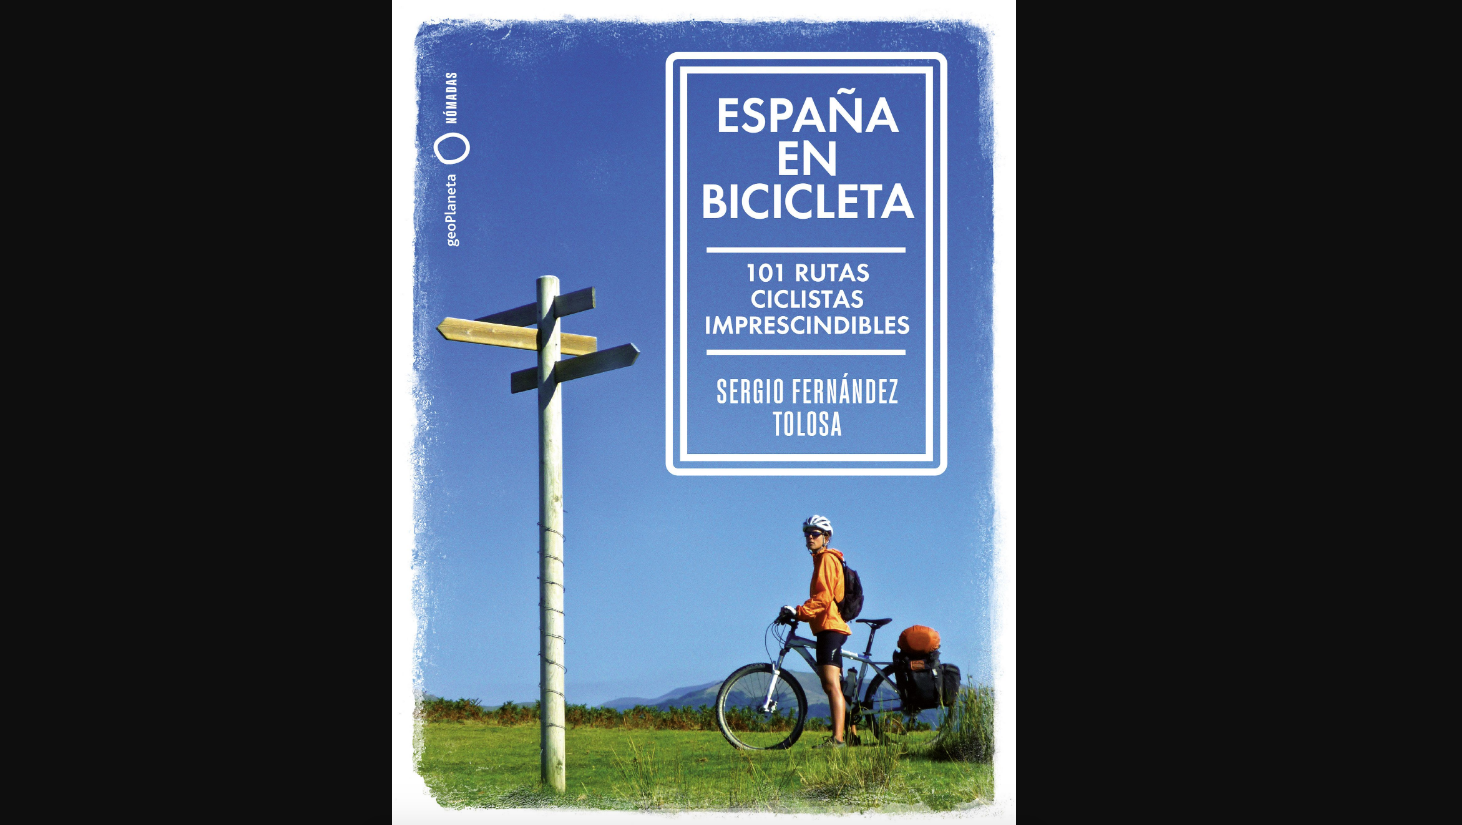 espana-en-bicicleta